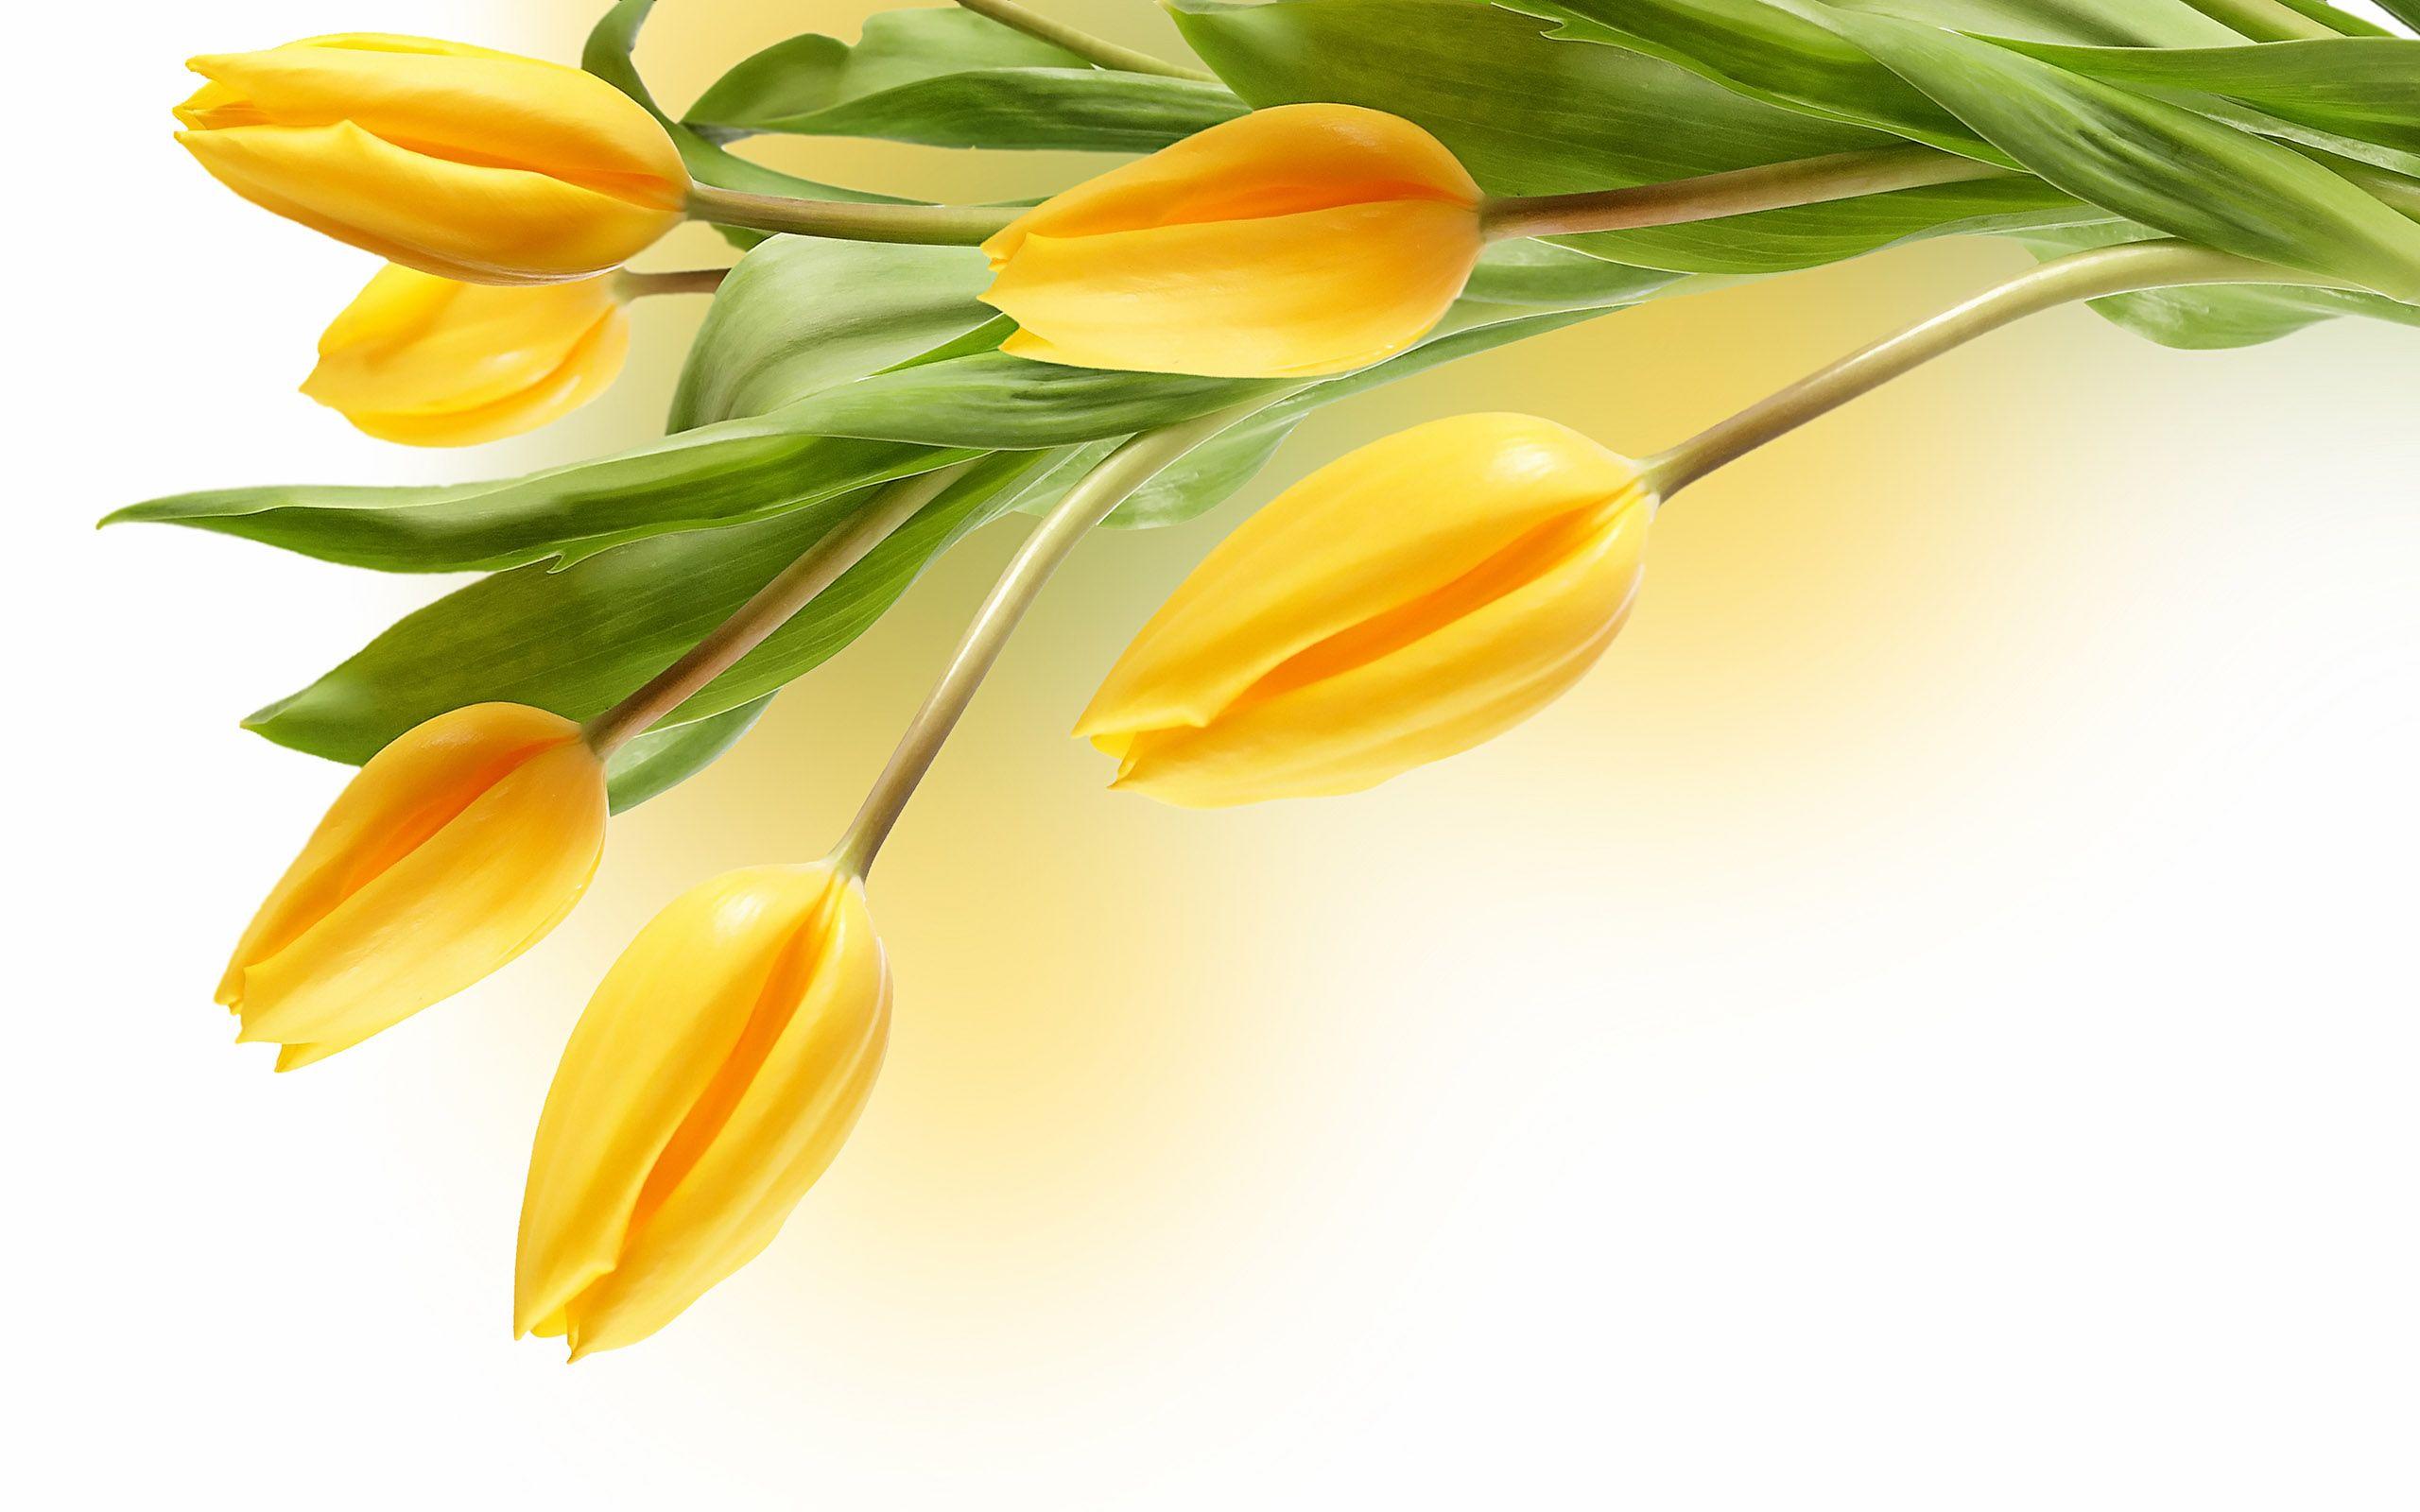 Large Tulip Picture 14062 Tulip Flowers Tulip Flower Pictures Yellow Tulips Flower Desktop Wallpaper